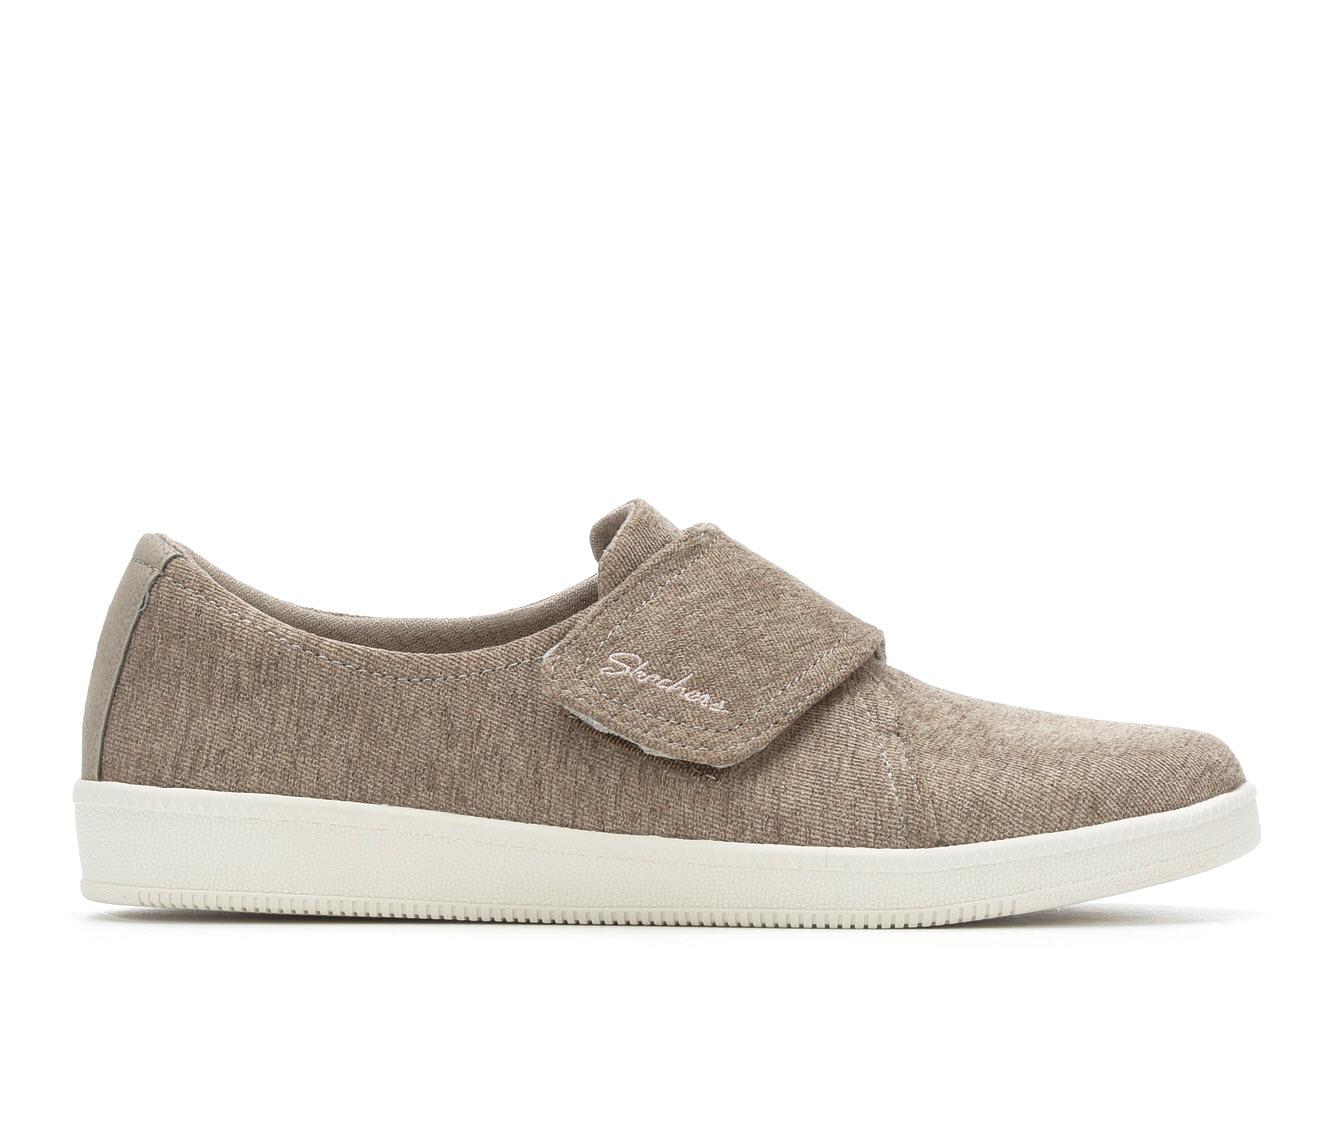 Skechers Distinctively 27114 Women's Shoe (Brown Canvas)